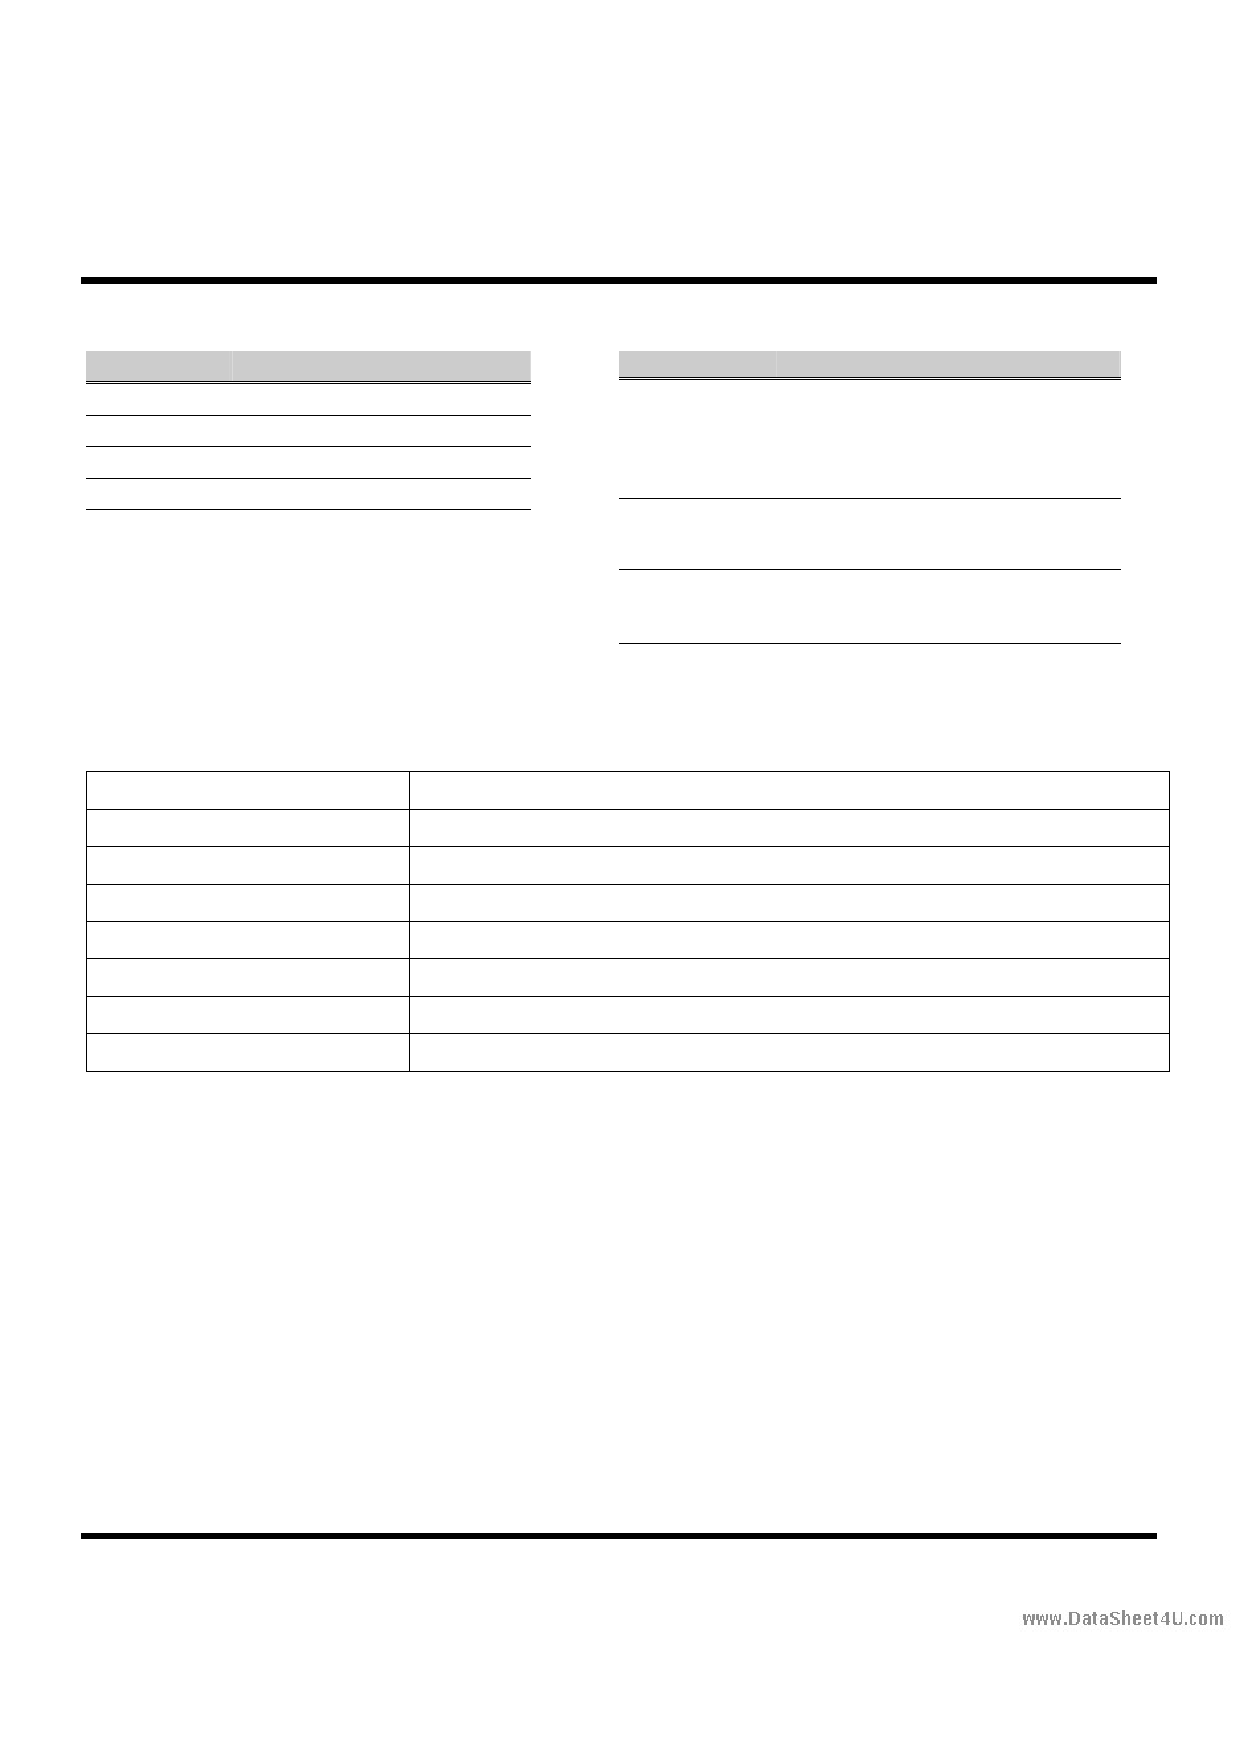 TS2GJF150 pdf, ピン配列